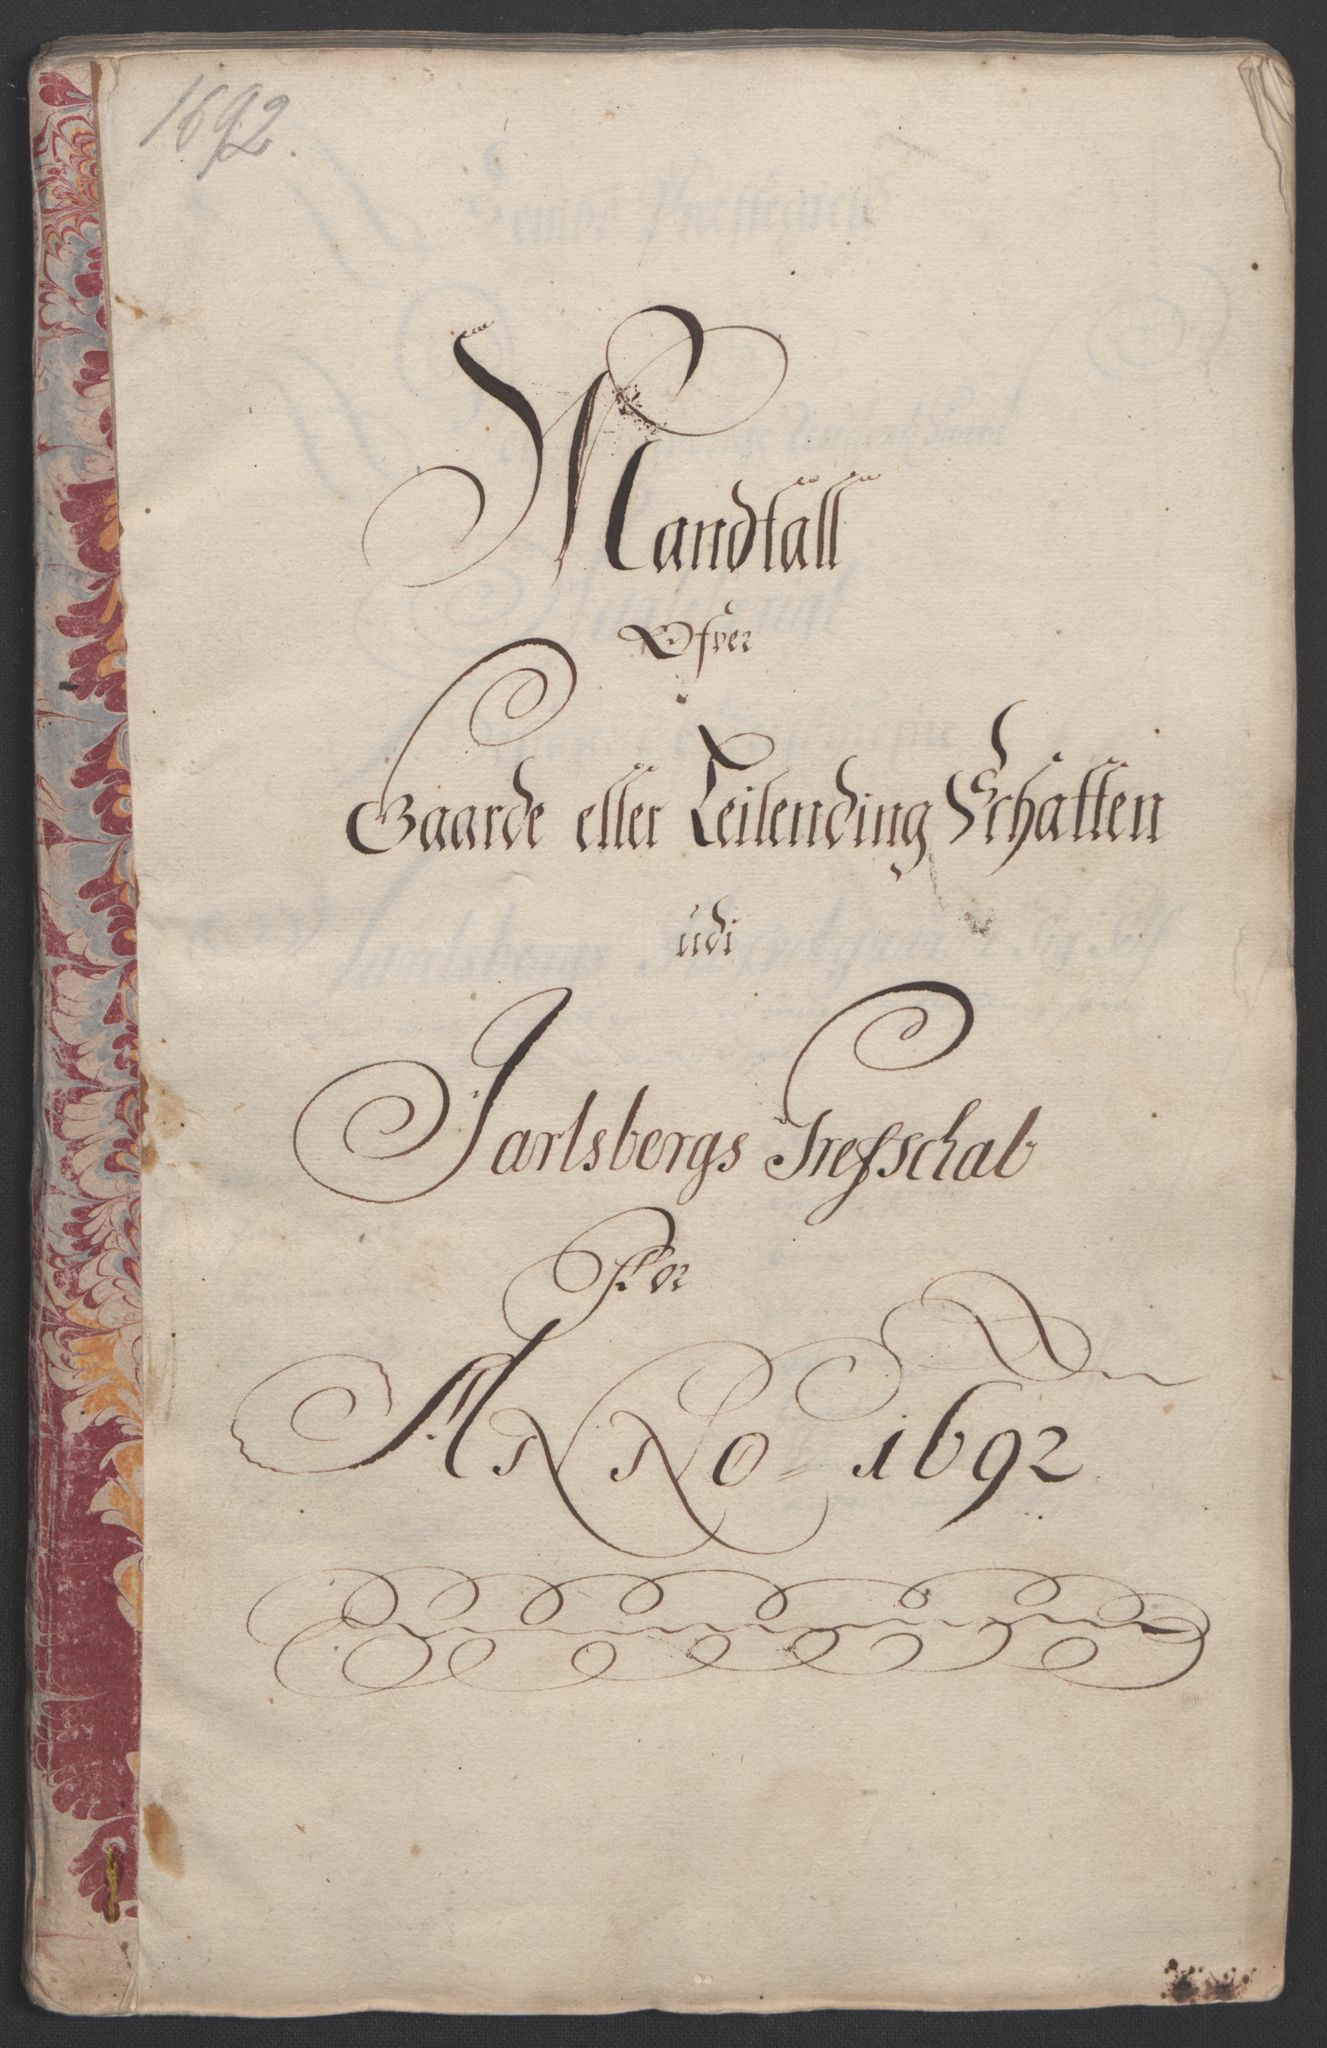 RA, Rentekammeret inntil 1814, Reviderte regnskaper, Fogderegnskap, R32/L1865: Fogderegnskap Jarlsberg grevskap, 1692, s. 18